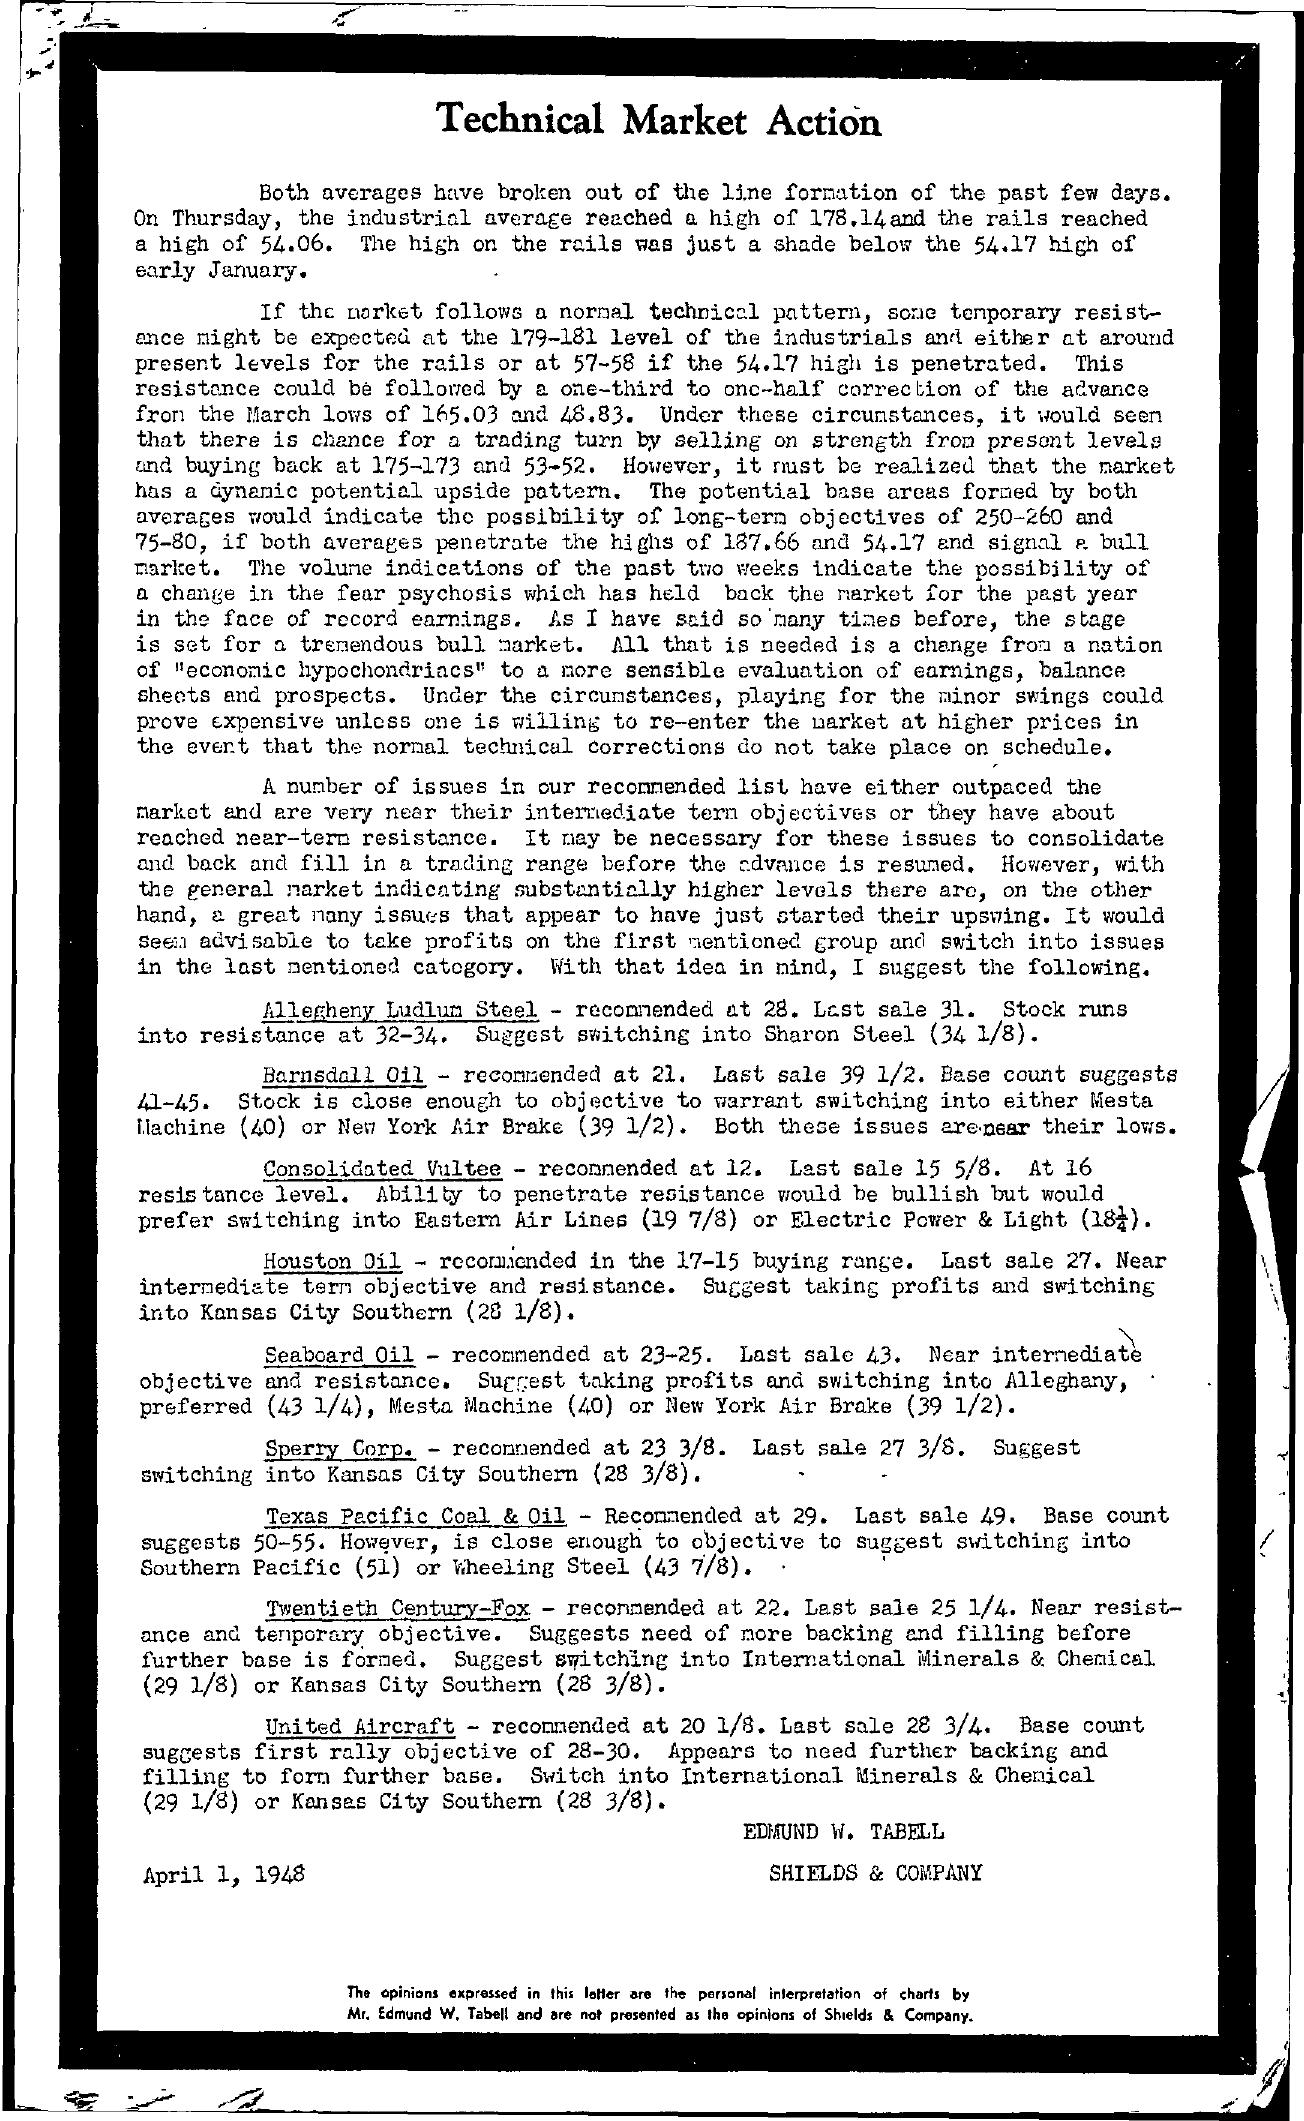 Tabell's Market Letter - April 01, 1948